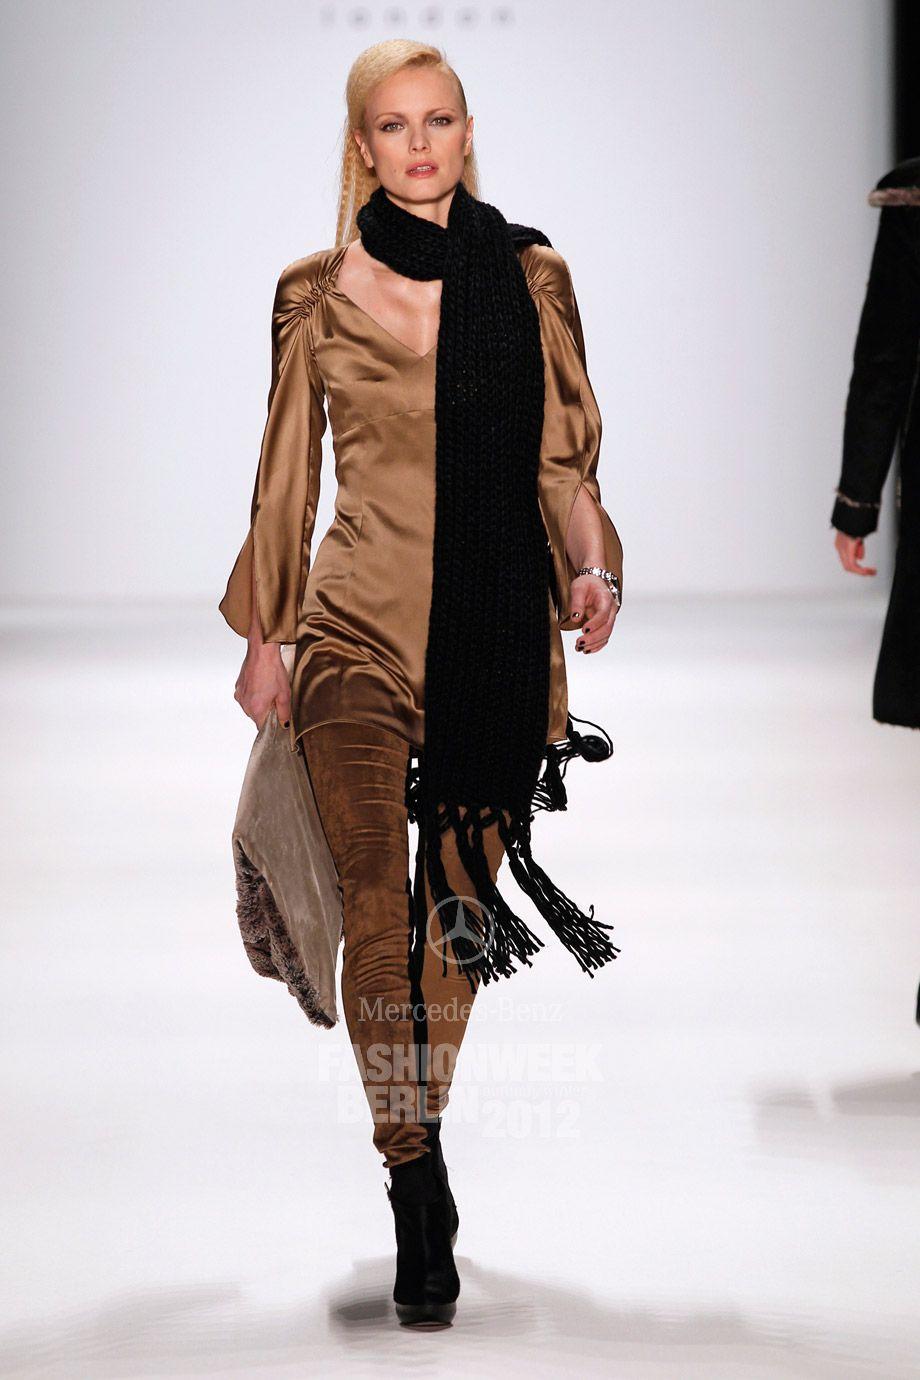 http://www.fashionweek-berlin.mercedes-benz.de/lookbooks-gallery/photo/6736581861/anja-gockel-aw-2012-anja-gockel-mercedes-benz-fashion-week-berlin-autumnwinter-2012039.html